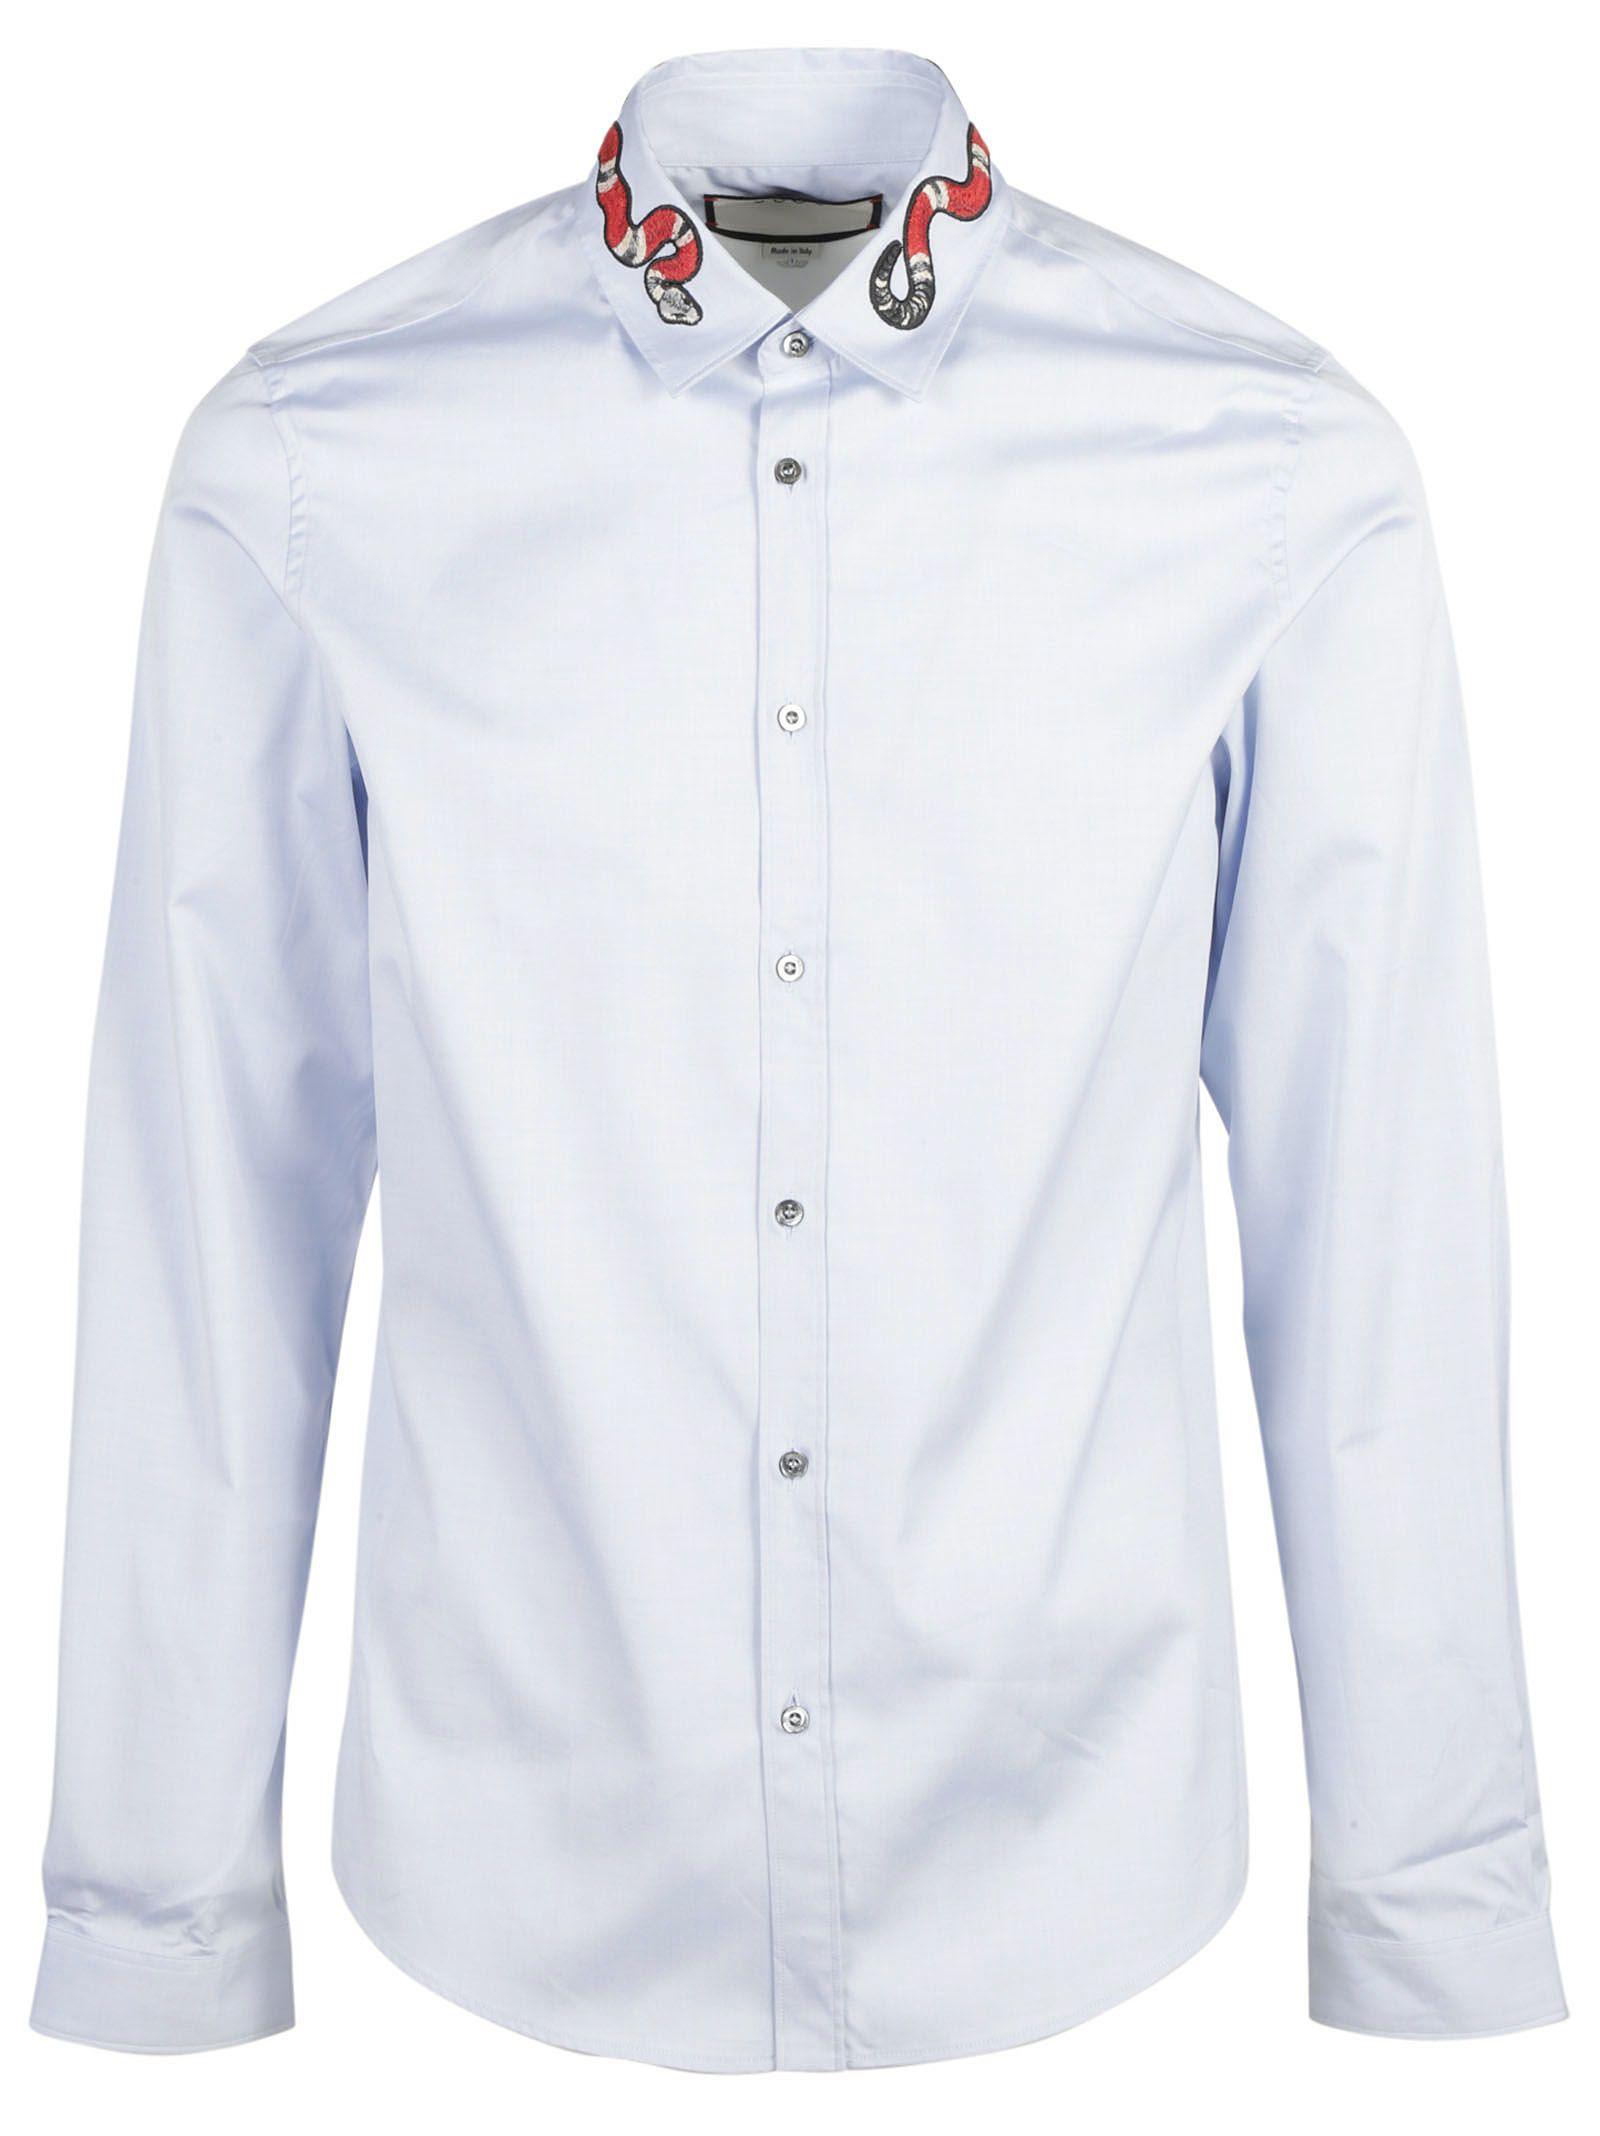 Gucci Dress Shirts For Men